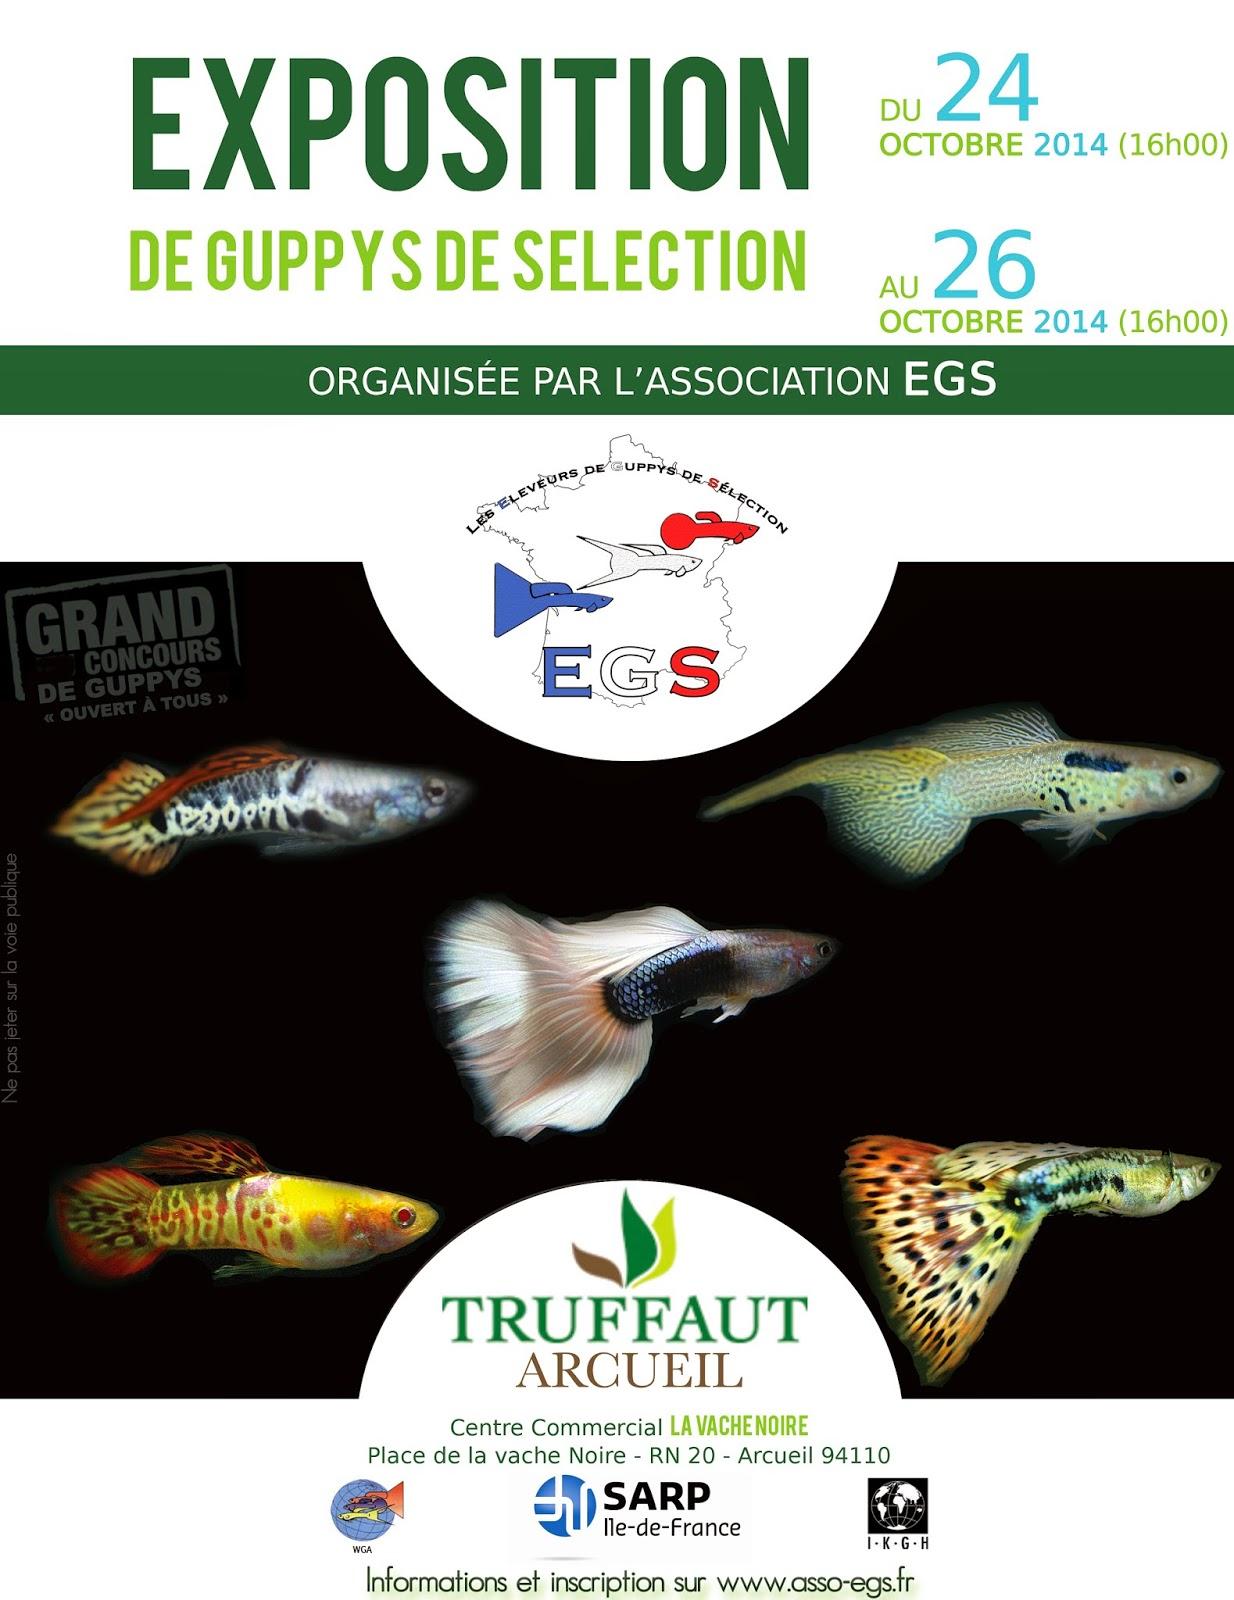 24-26-Octobre-2014-Exposition-Concours-de-Guppys-de-Selection-truffaut-arcueil